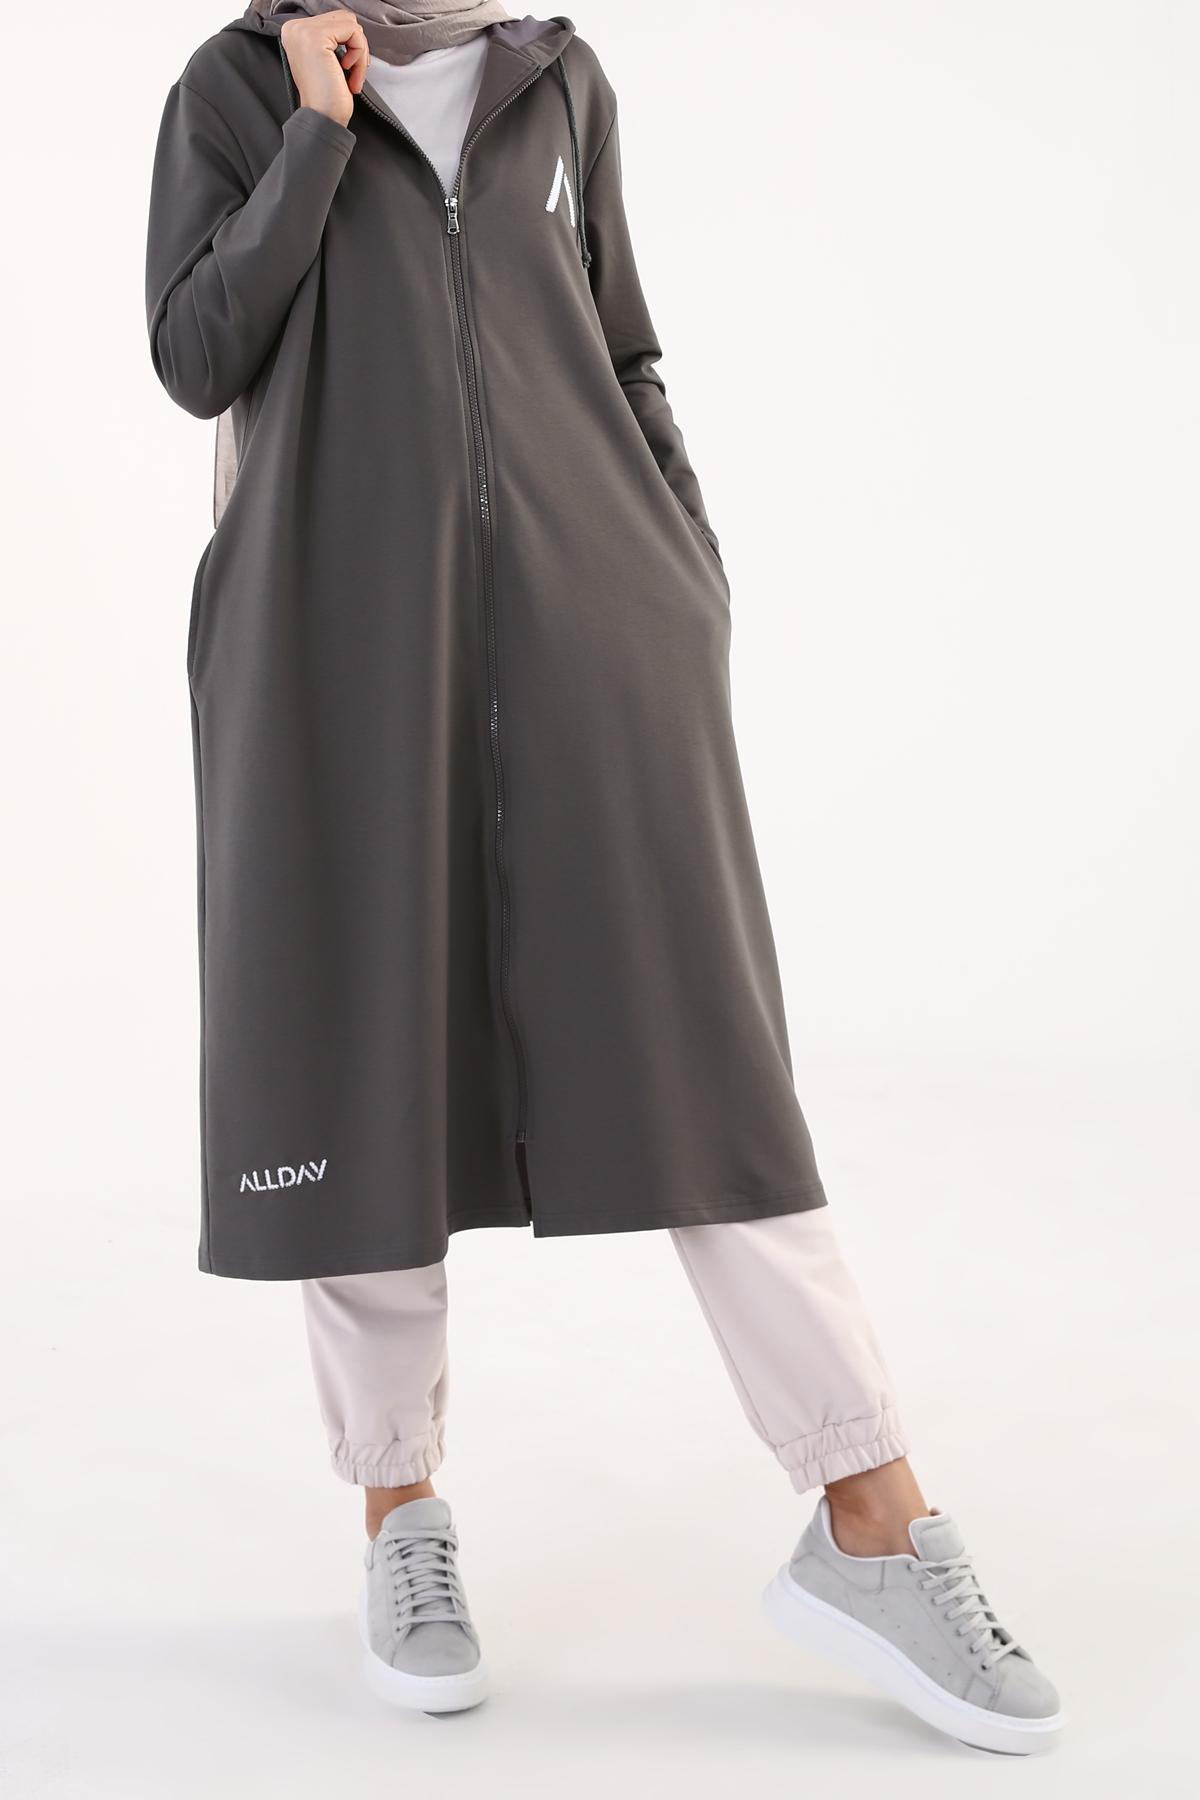 Printed Plus Size Cardigan